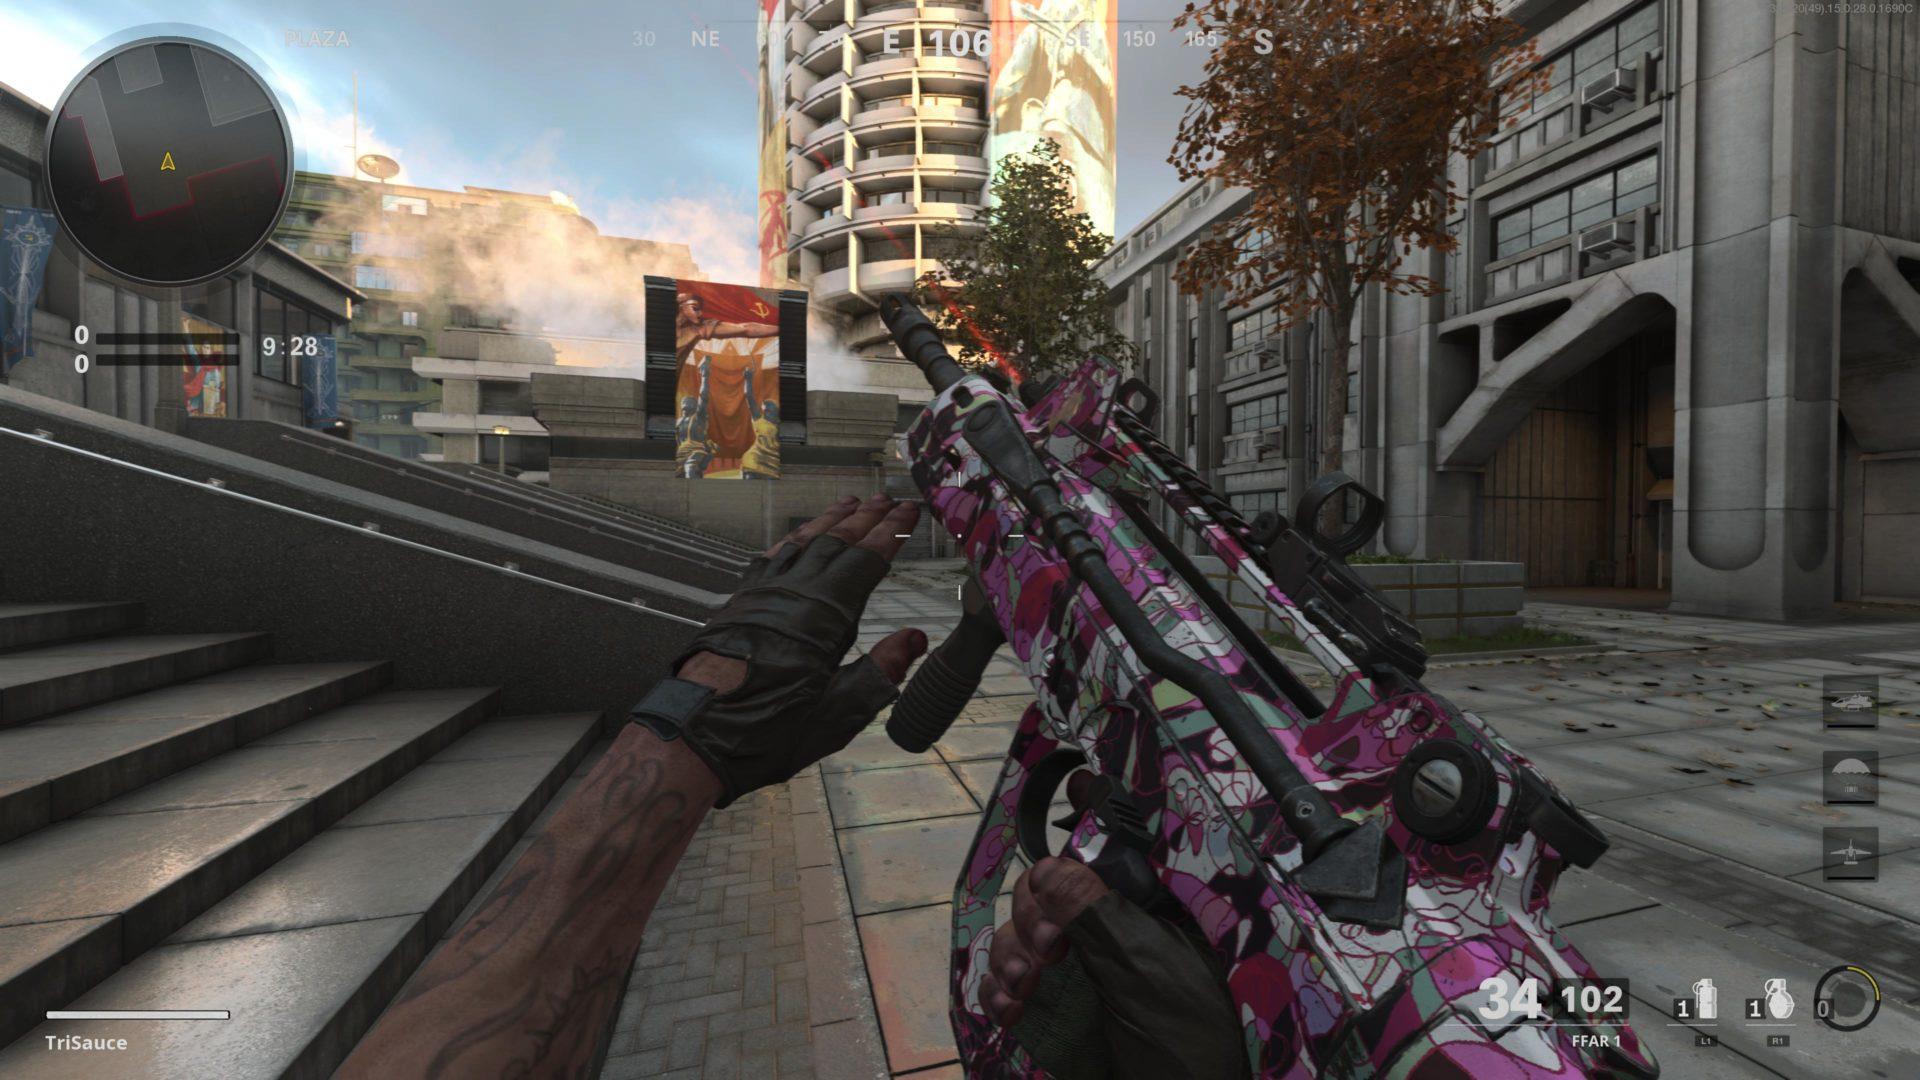 Black Ops Cold War FFAR 1